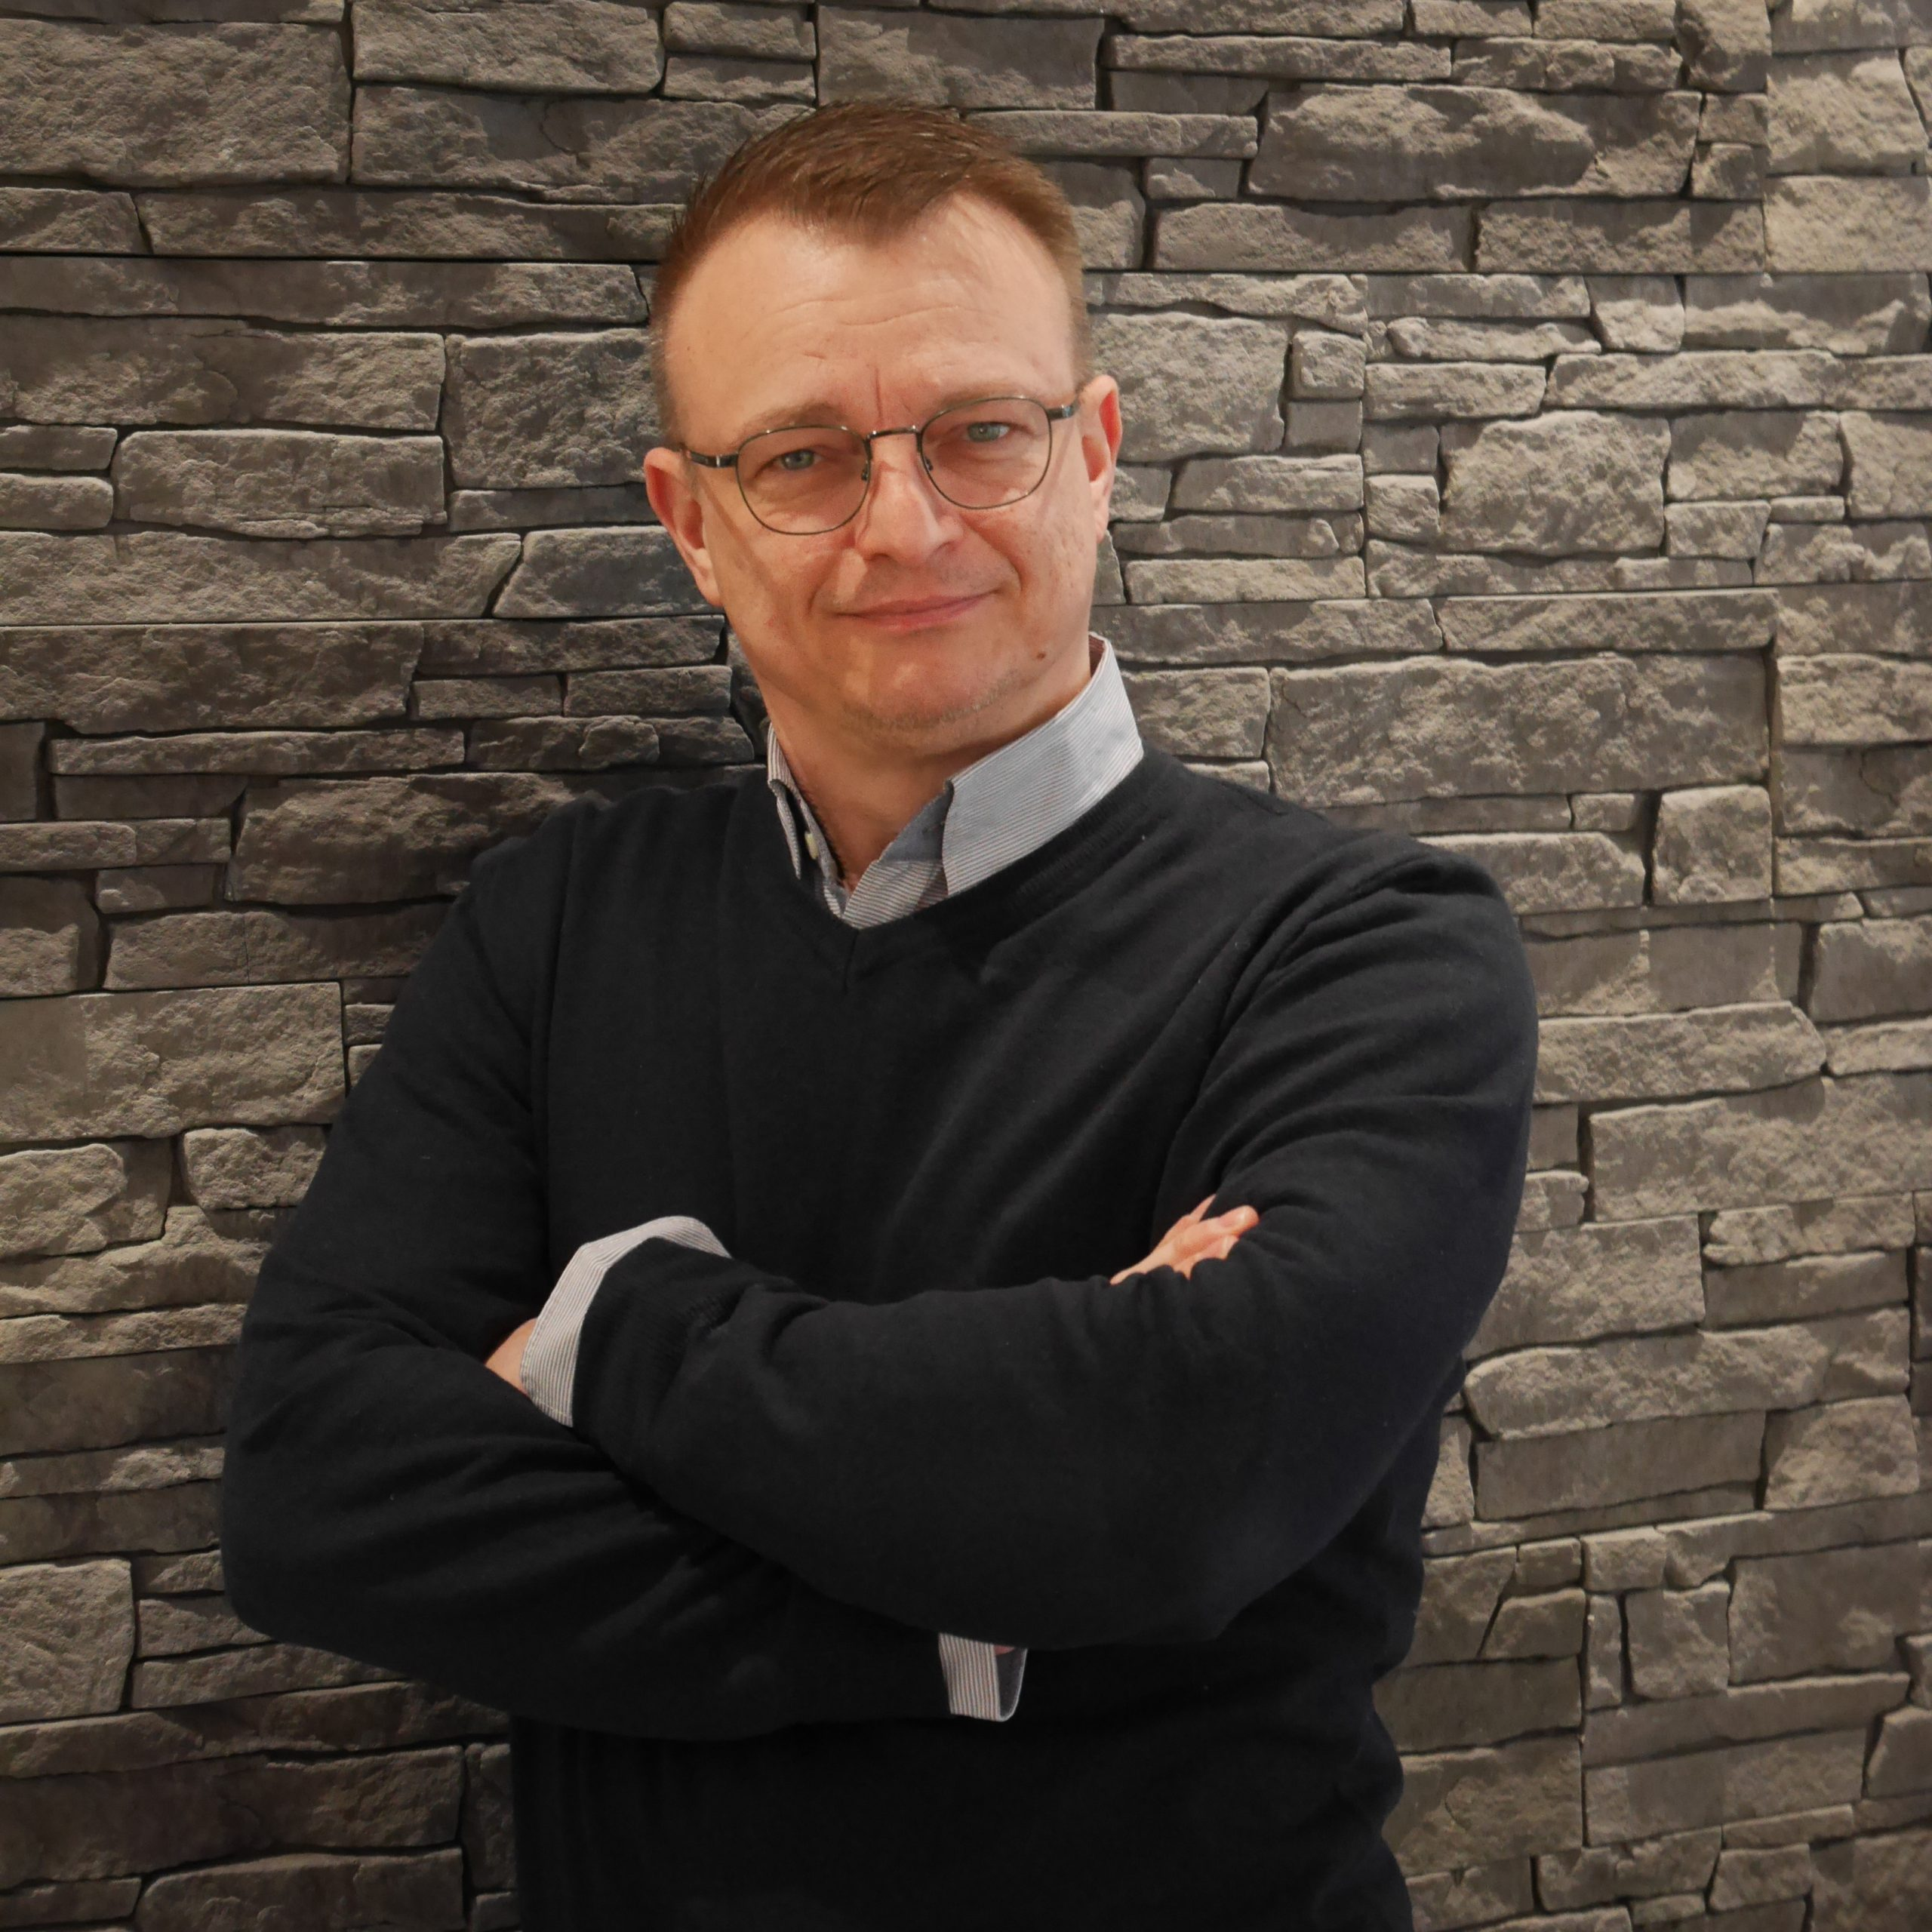 Optik Dopp Marco Wobker Augenoptiker Low Vision Uhrenspezialist